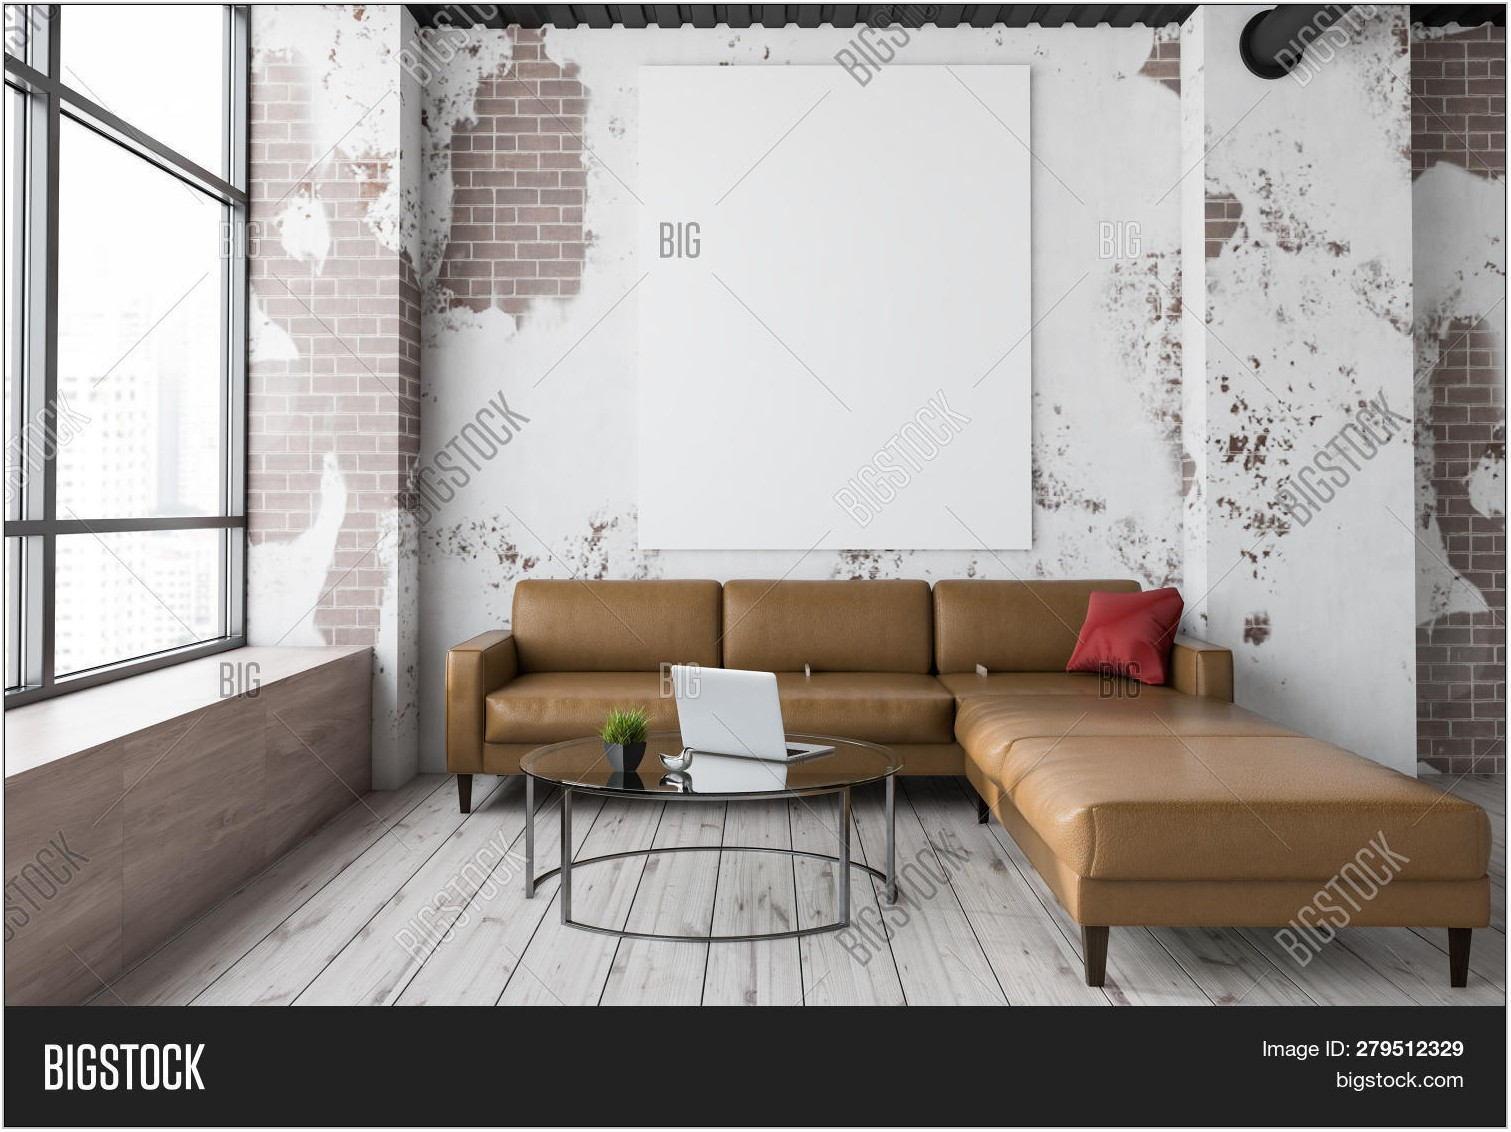 Living Room Free Image